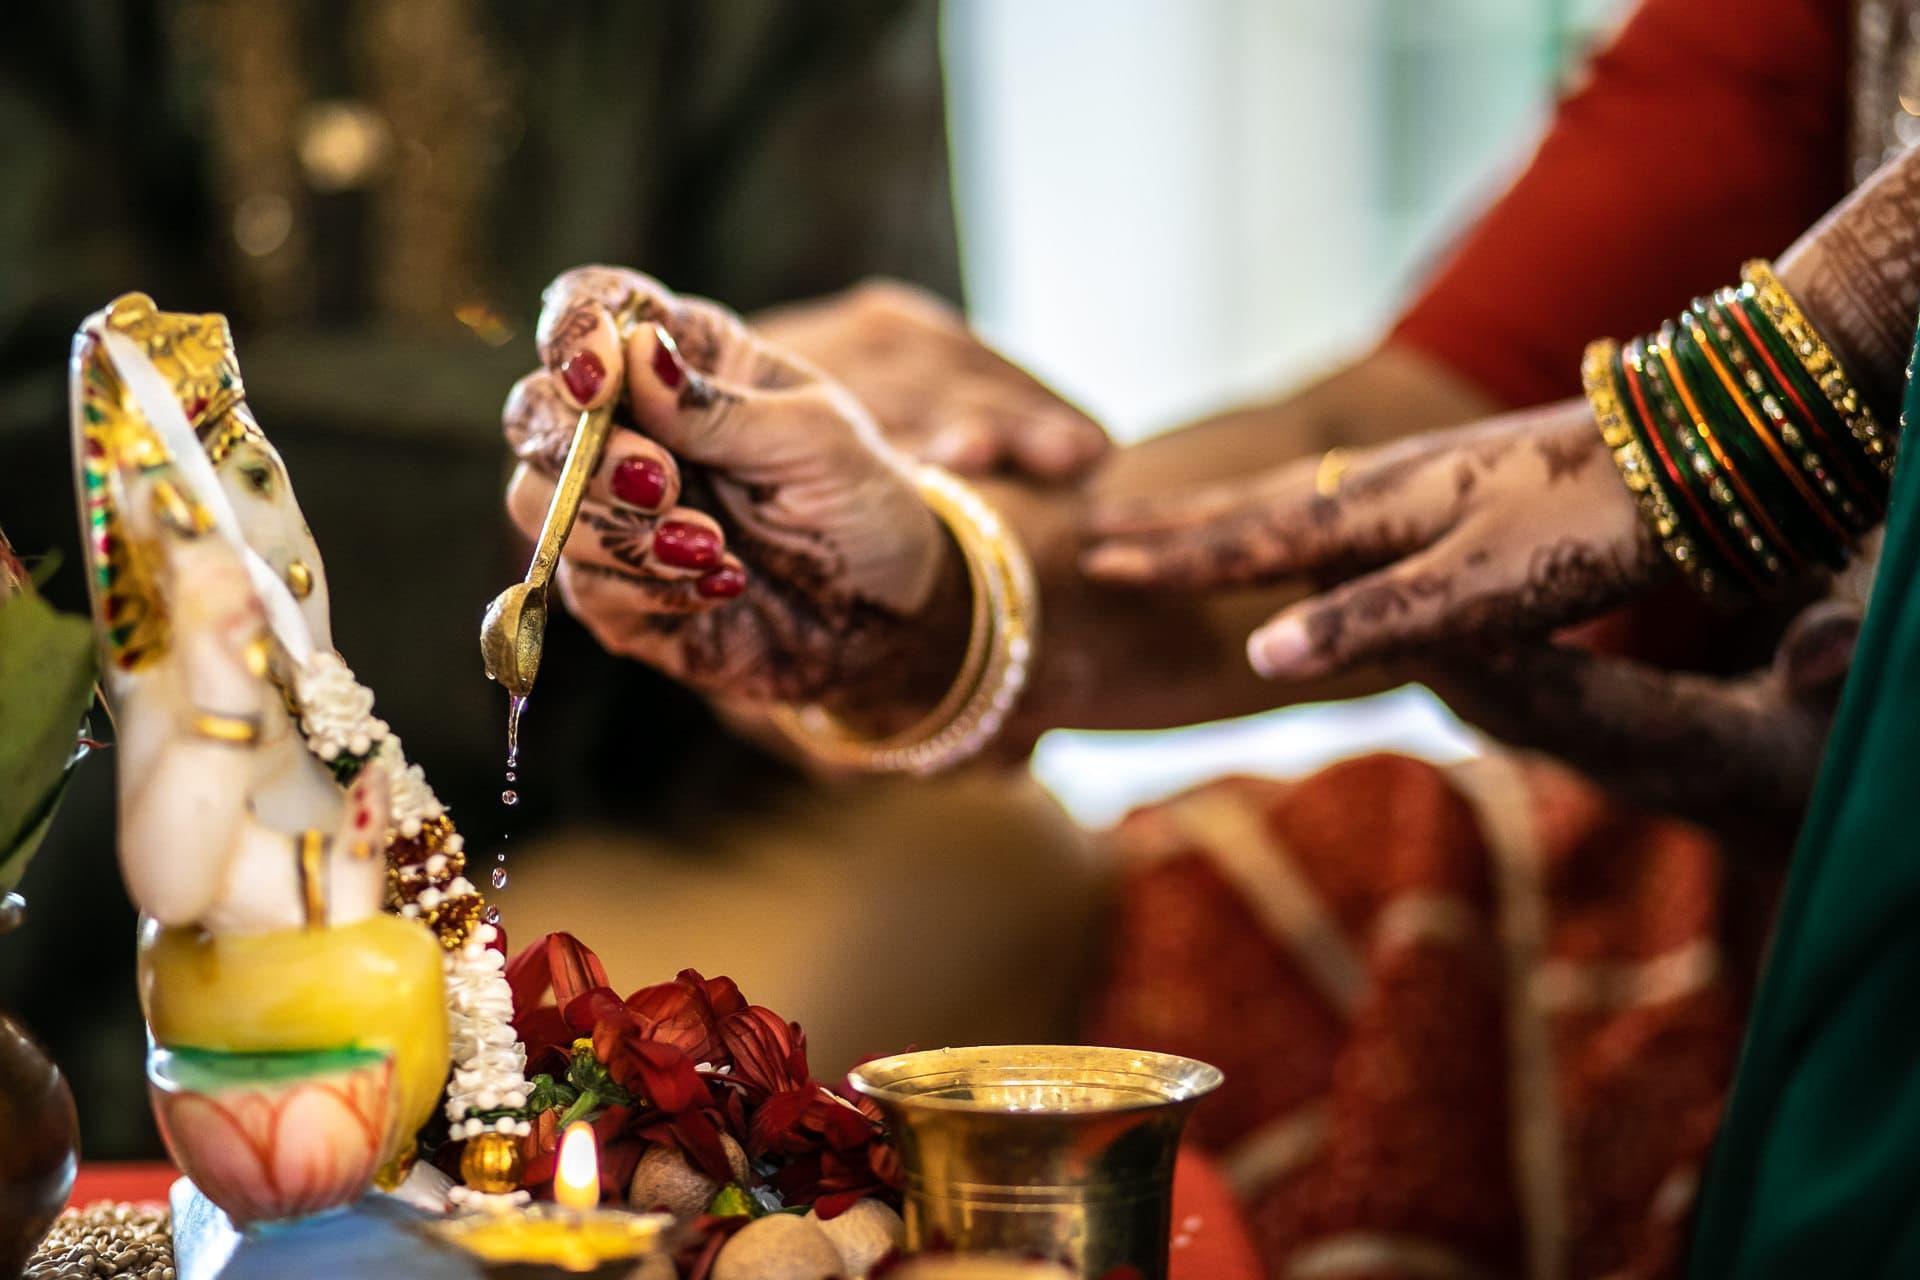 Ganesh Pooja ceremony during Hindu Wedding